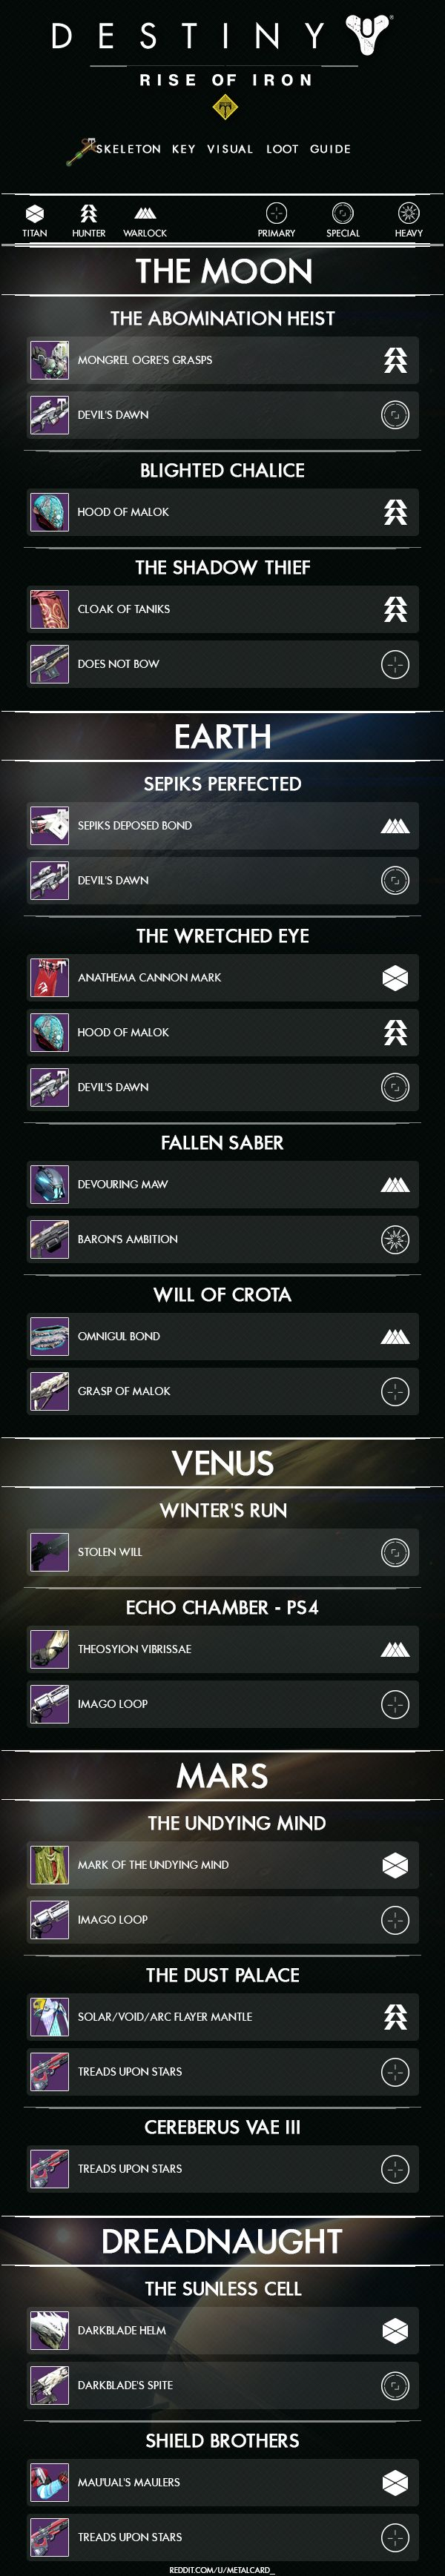 Destiny - Rise of Iron - Skeleton Key Visual Loot Guide